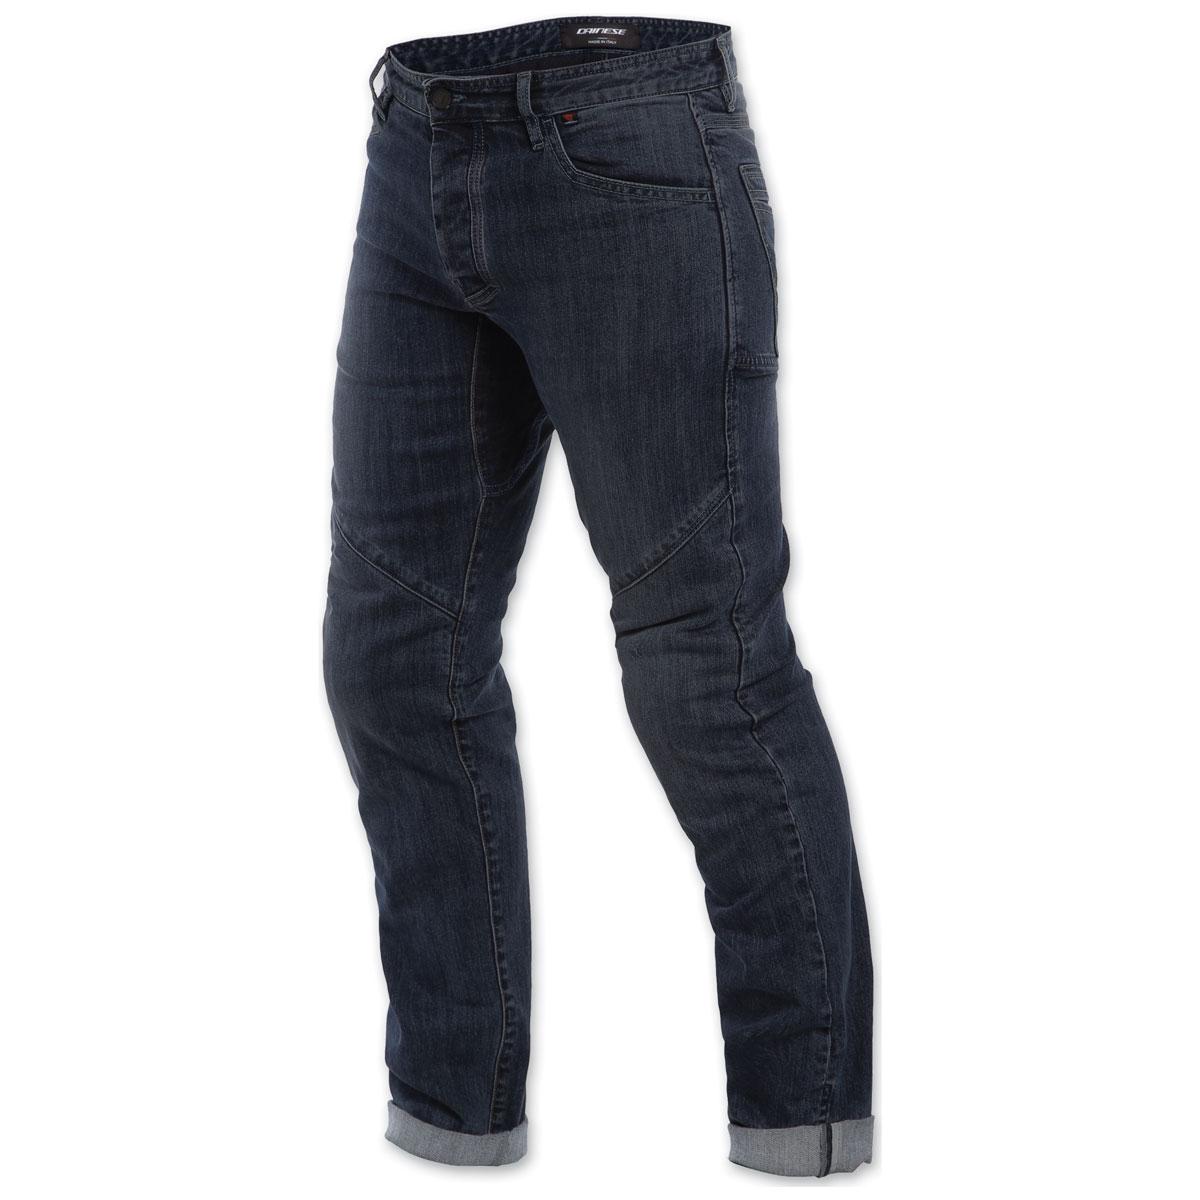 Dainese Men's Tivoli Dark Denim Jeans